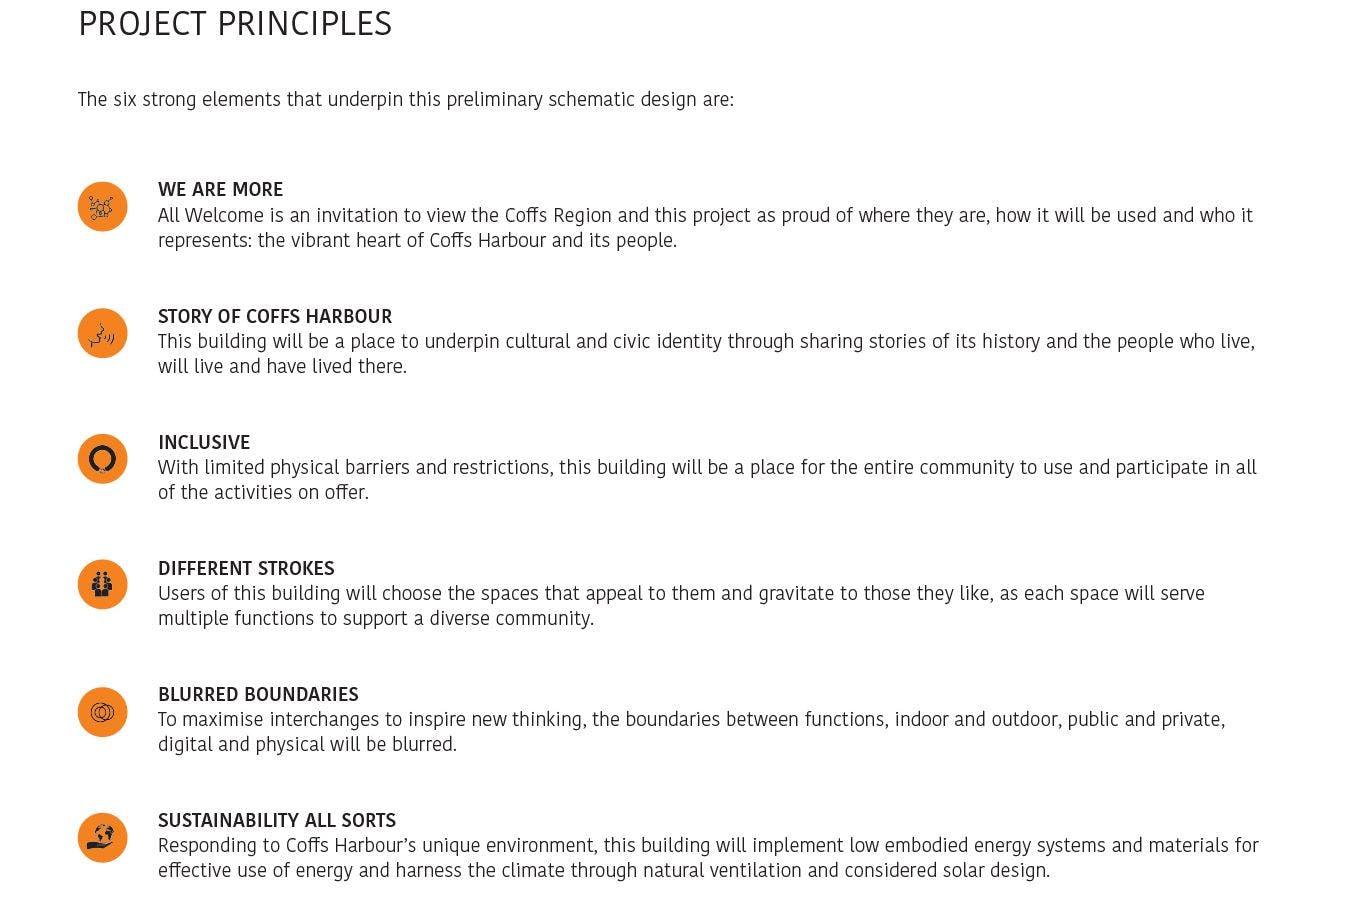 Project Principles